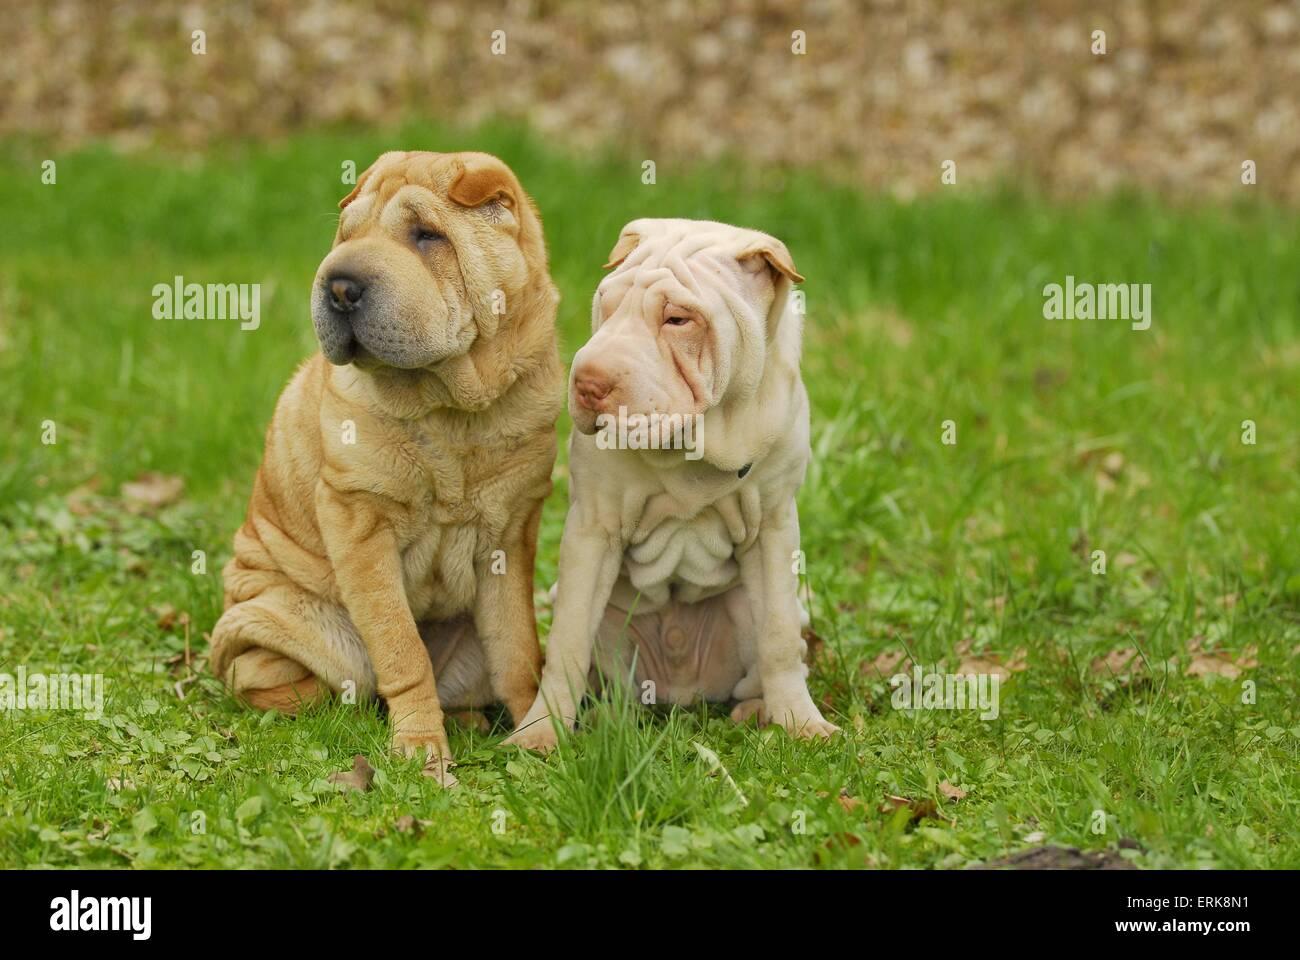 Shar Peis - Stock Image